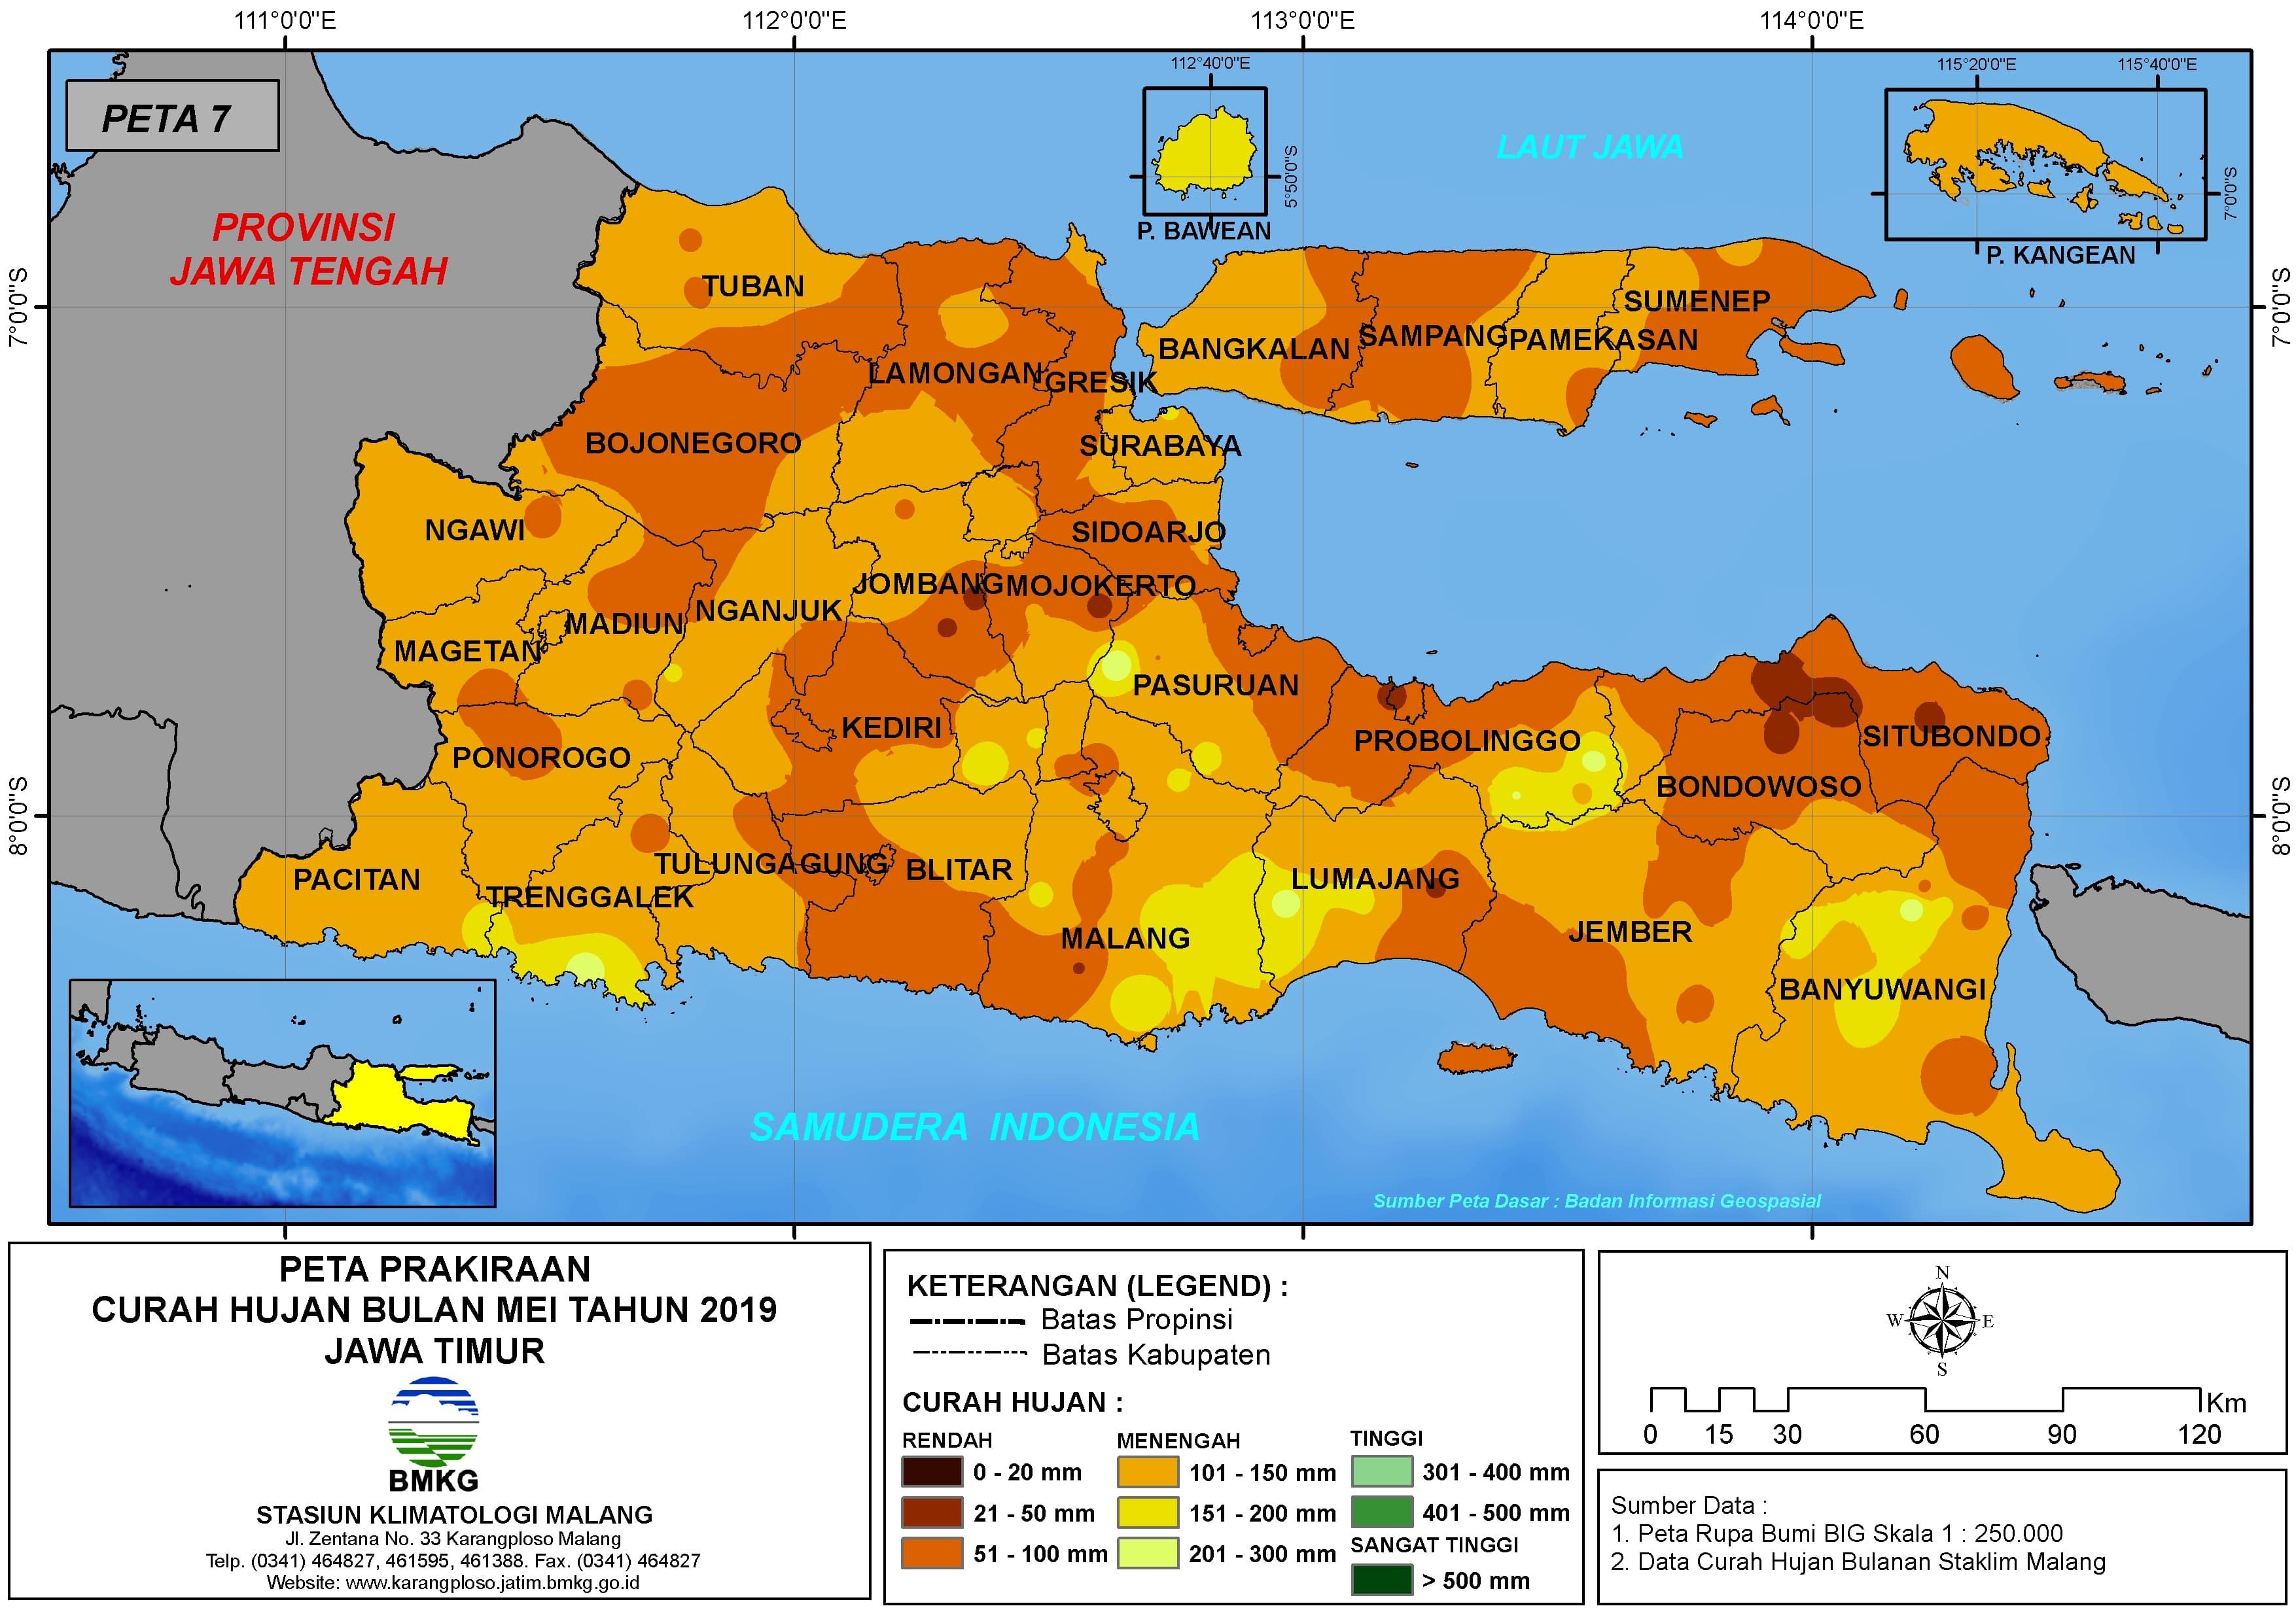 Prakiraan Curah Hujan Bulan Mei Tahun 2019 di Provinsi Jawa Timur Update dari Analisis Bulan Februari 2019